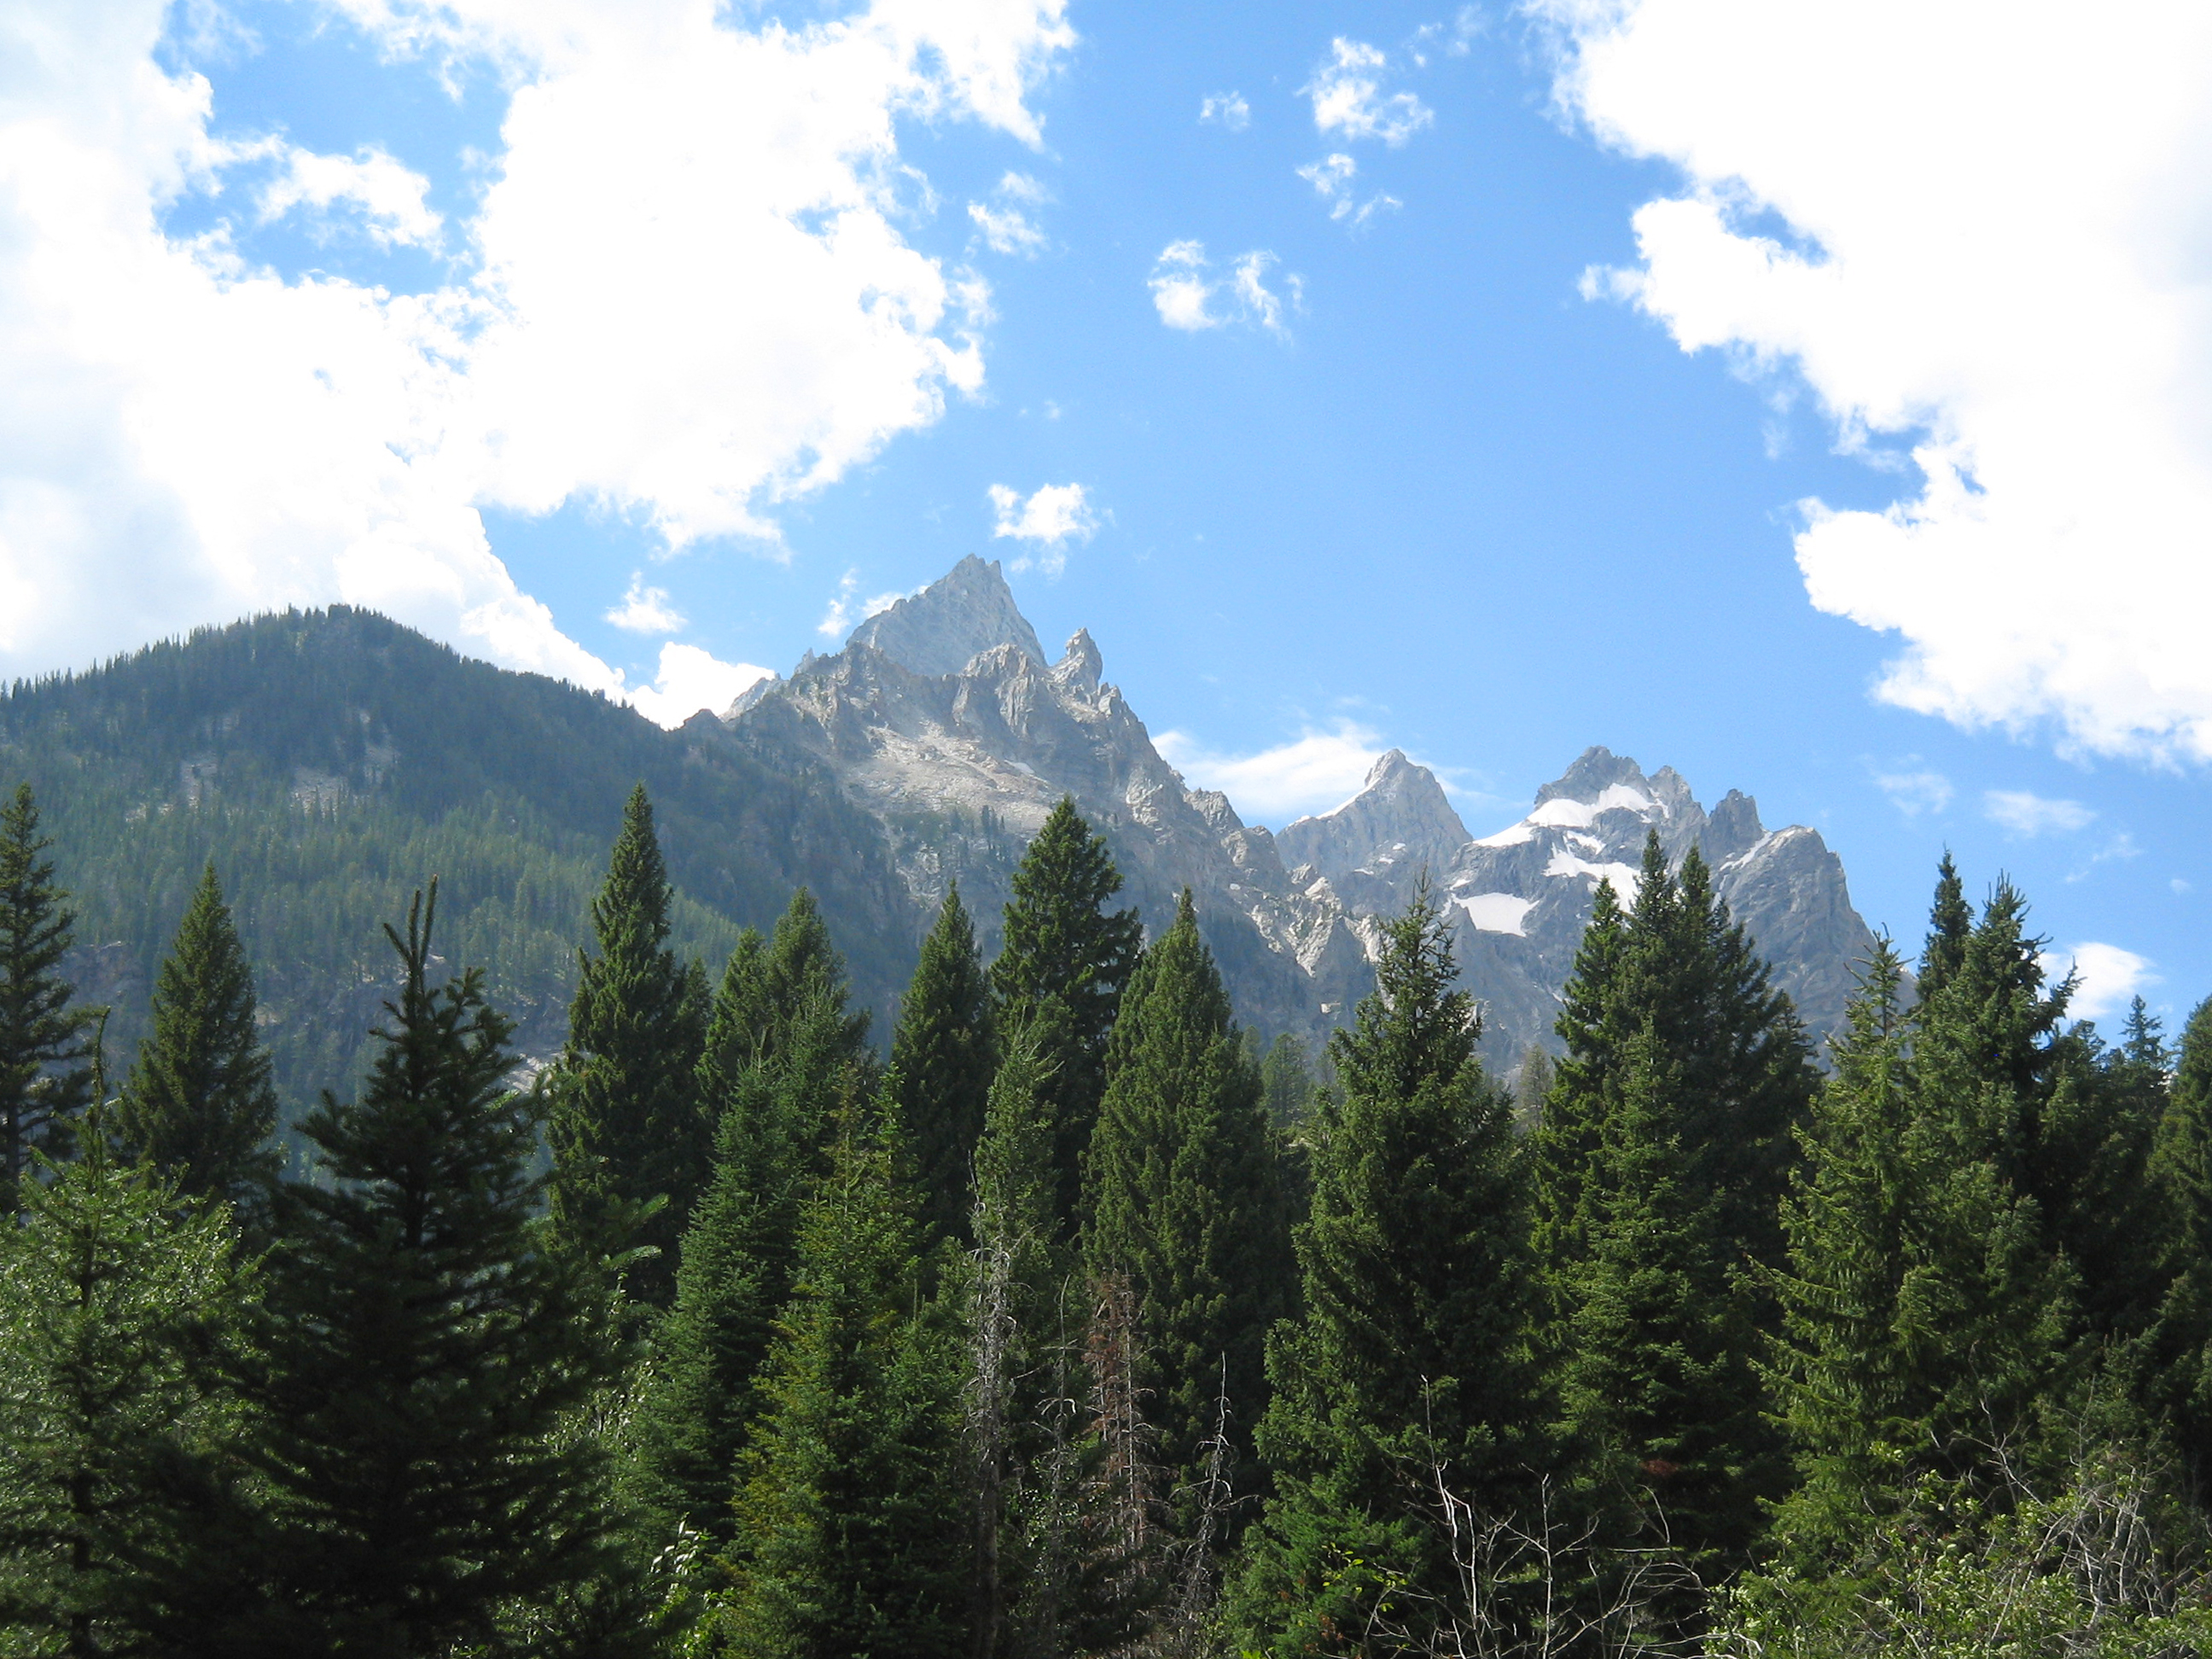 Douglas fir - Pseudotsuga menziesii 23